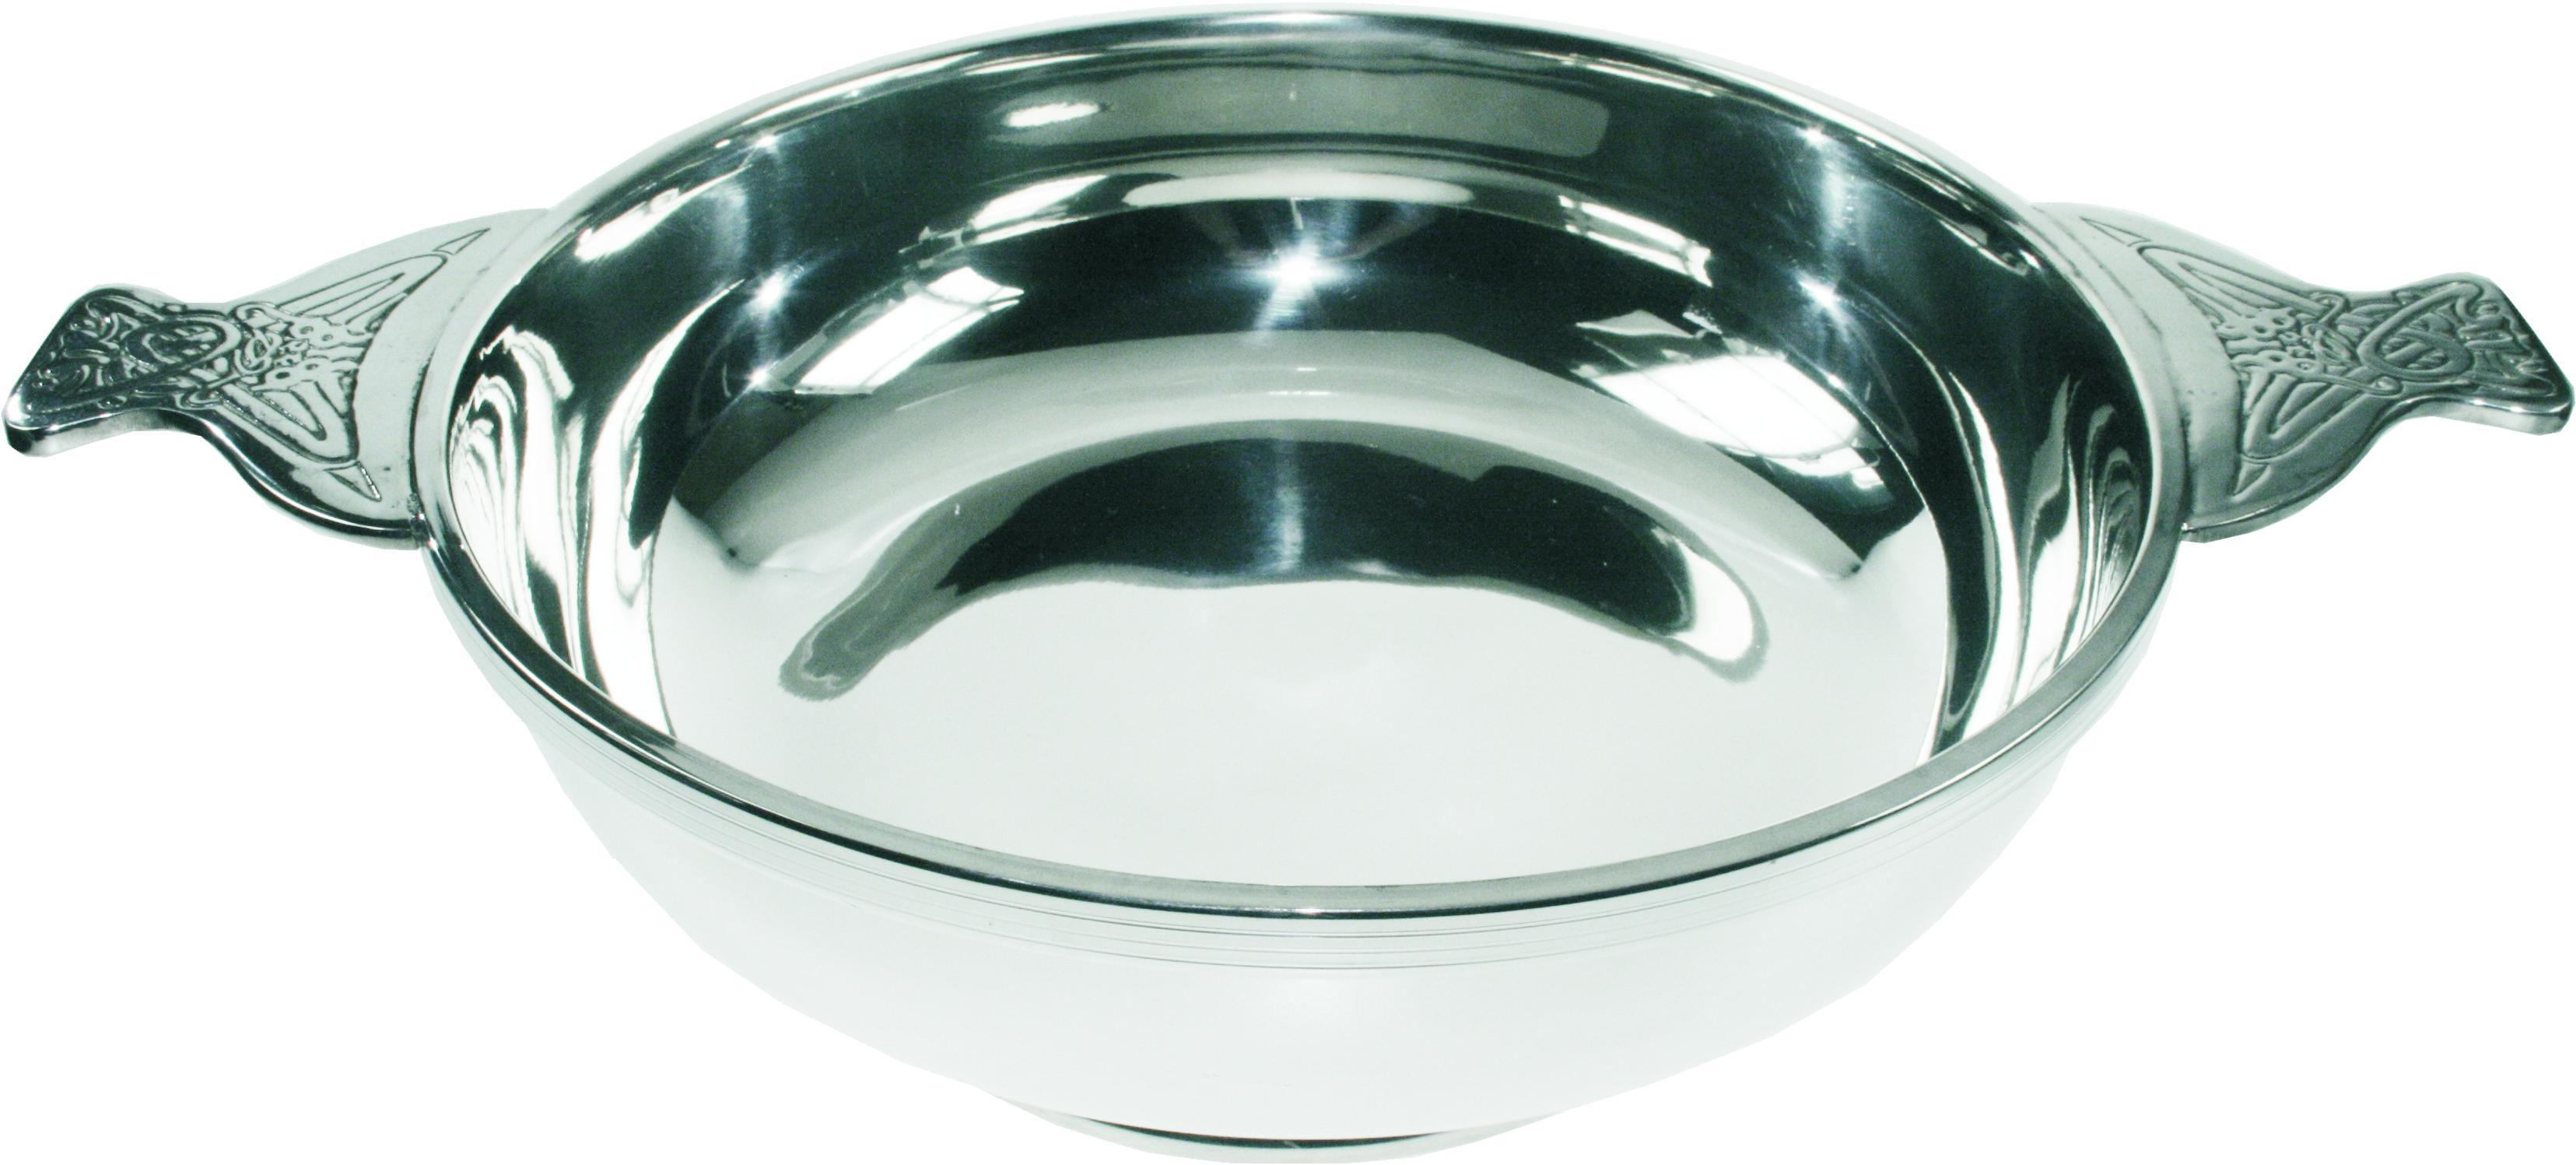 Pewter Quaich Bowl with Celtic Patterned Handle 25cm (9.75)